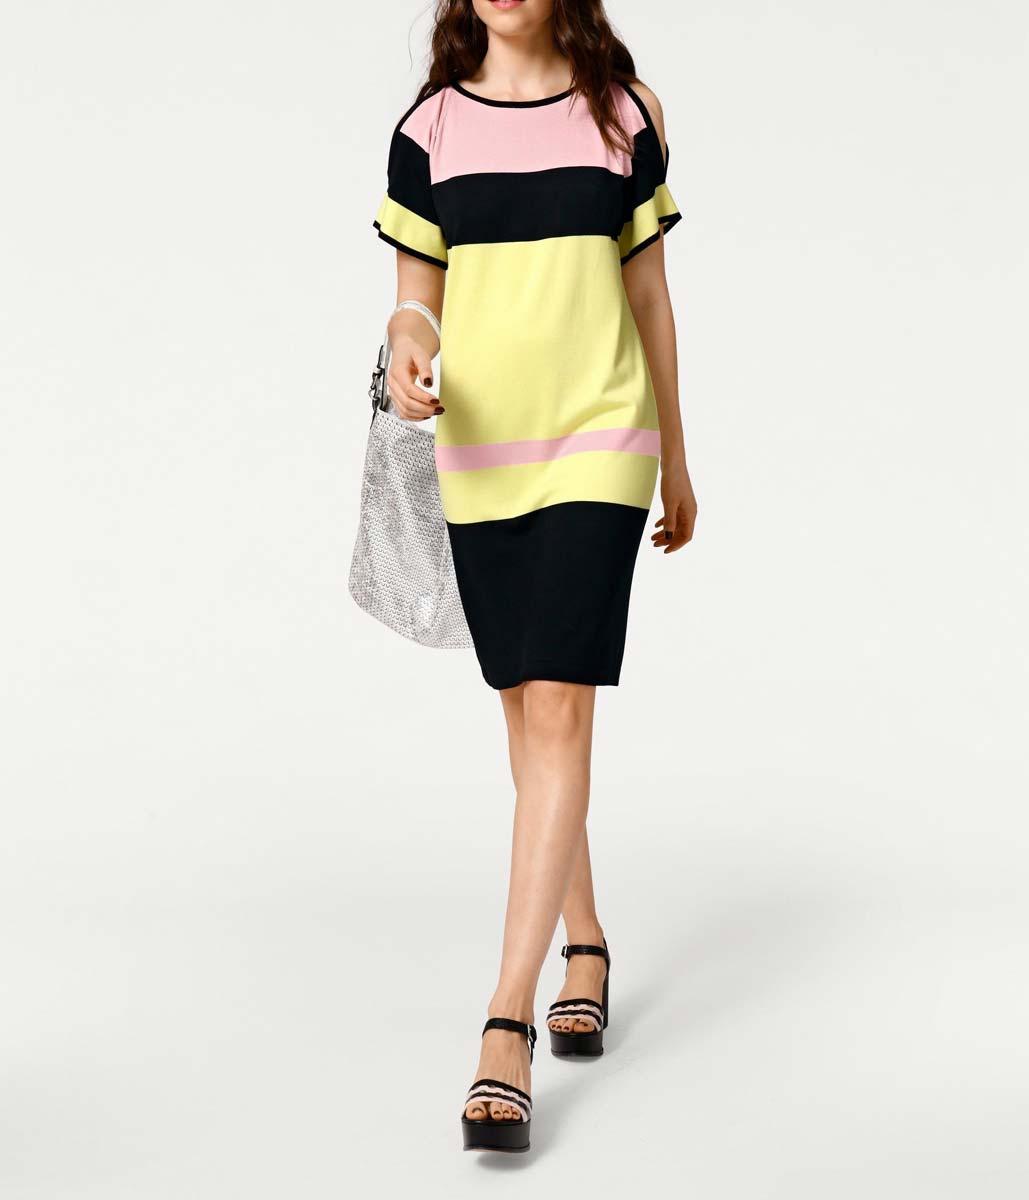 016.242 RICK CARDONA Damen Designer-Feinstrickkleid m. Cut-Outs Bunt